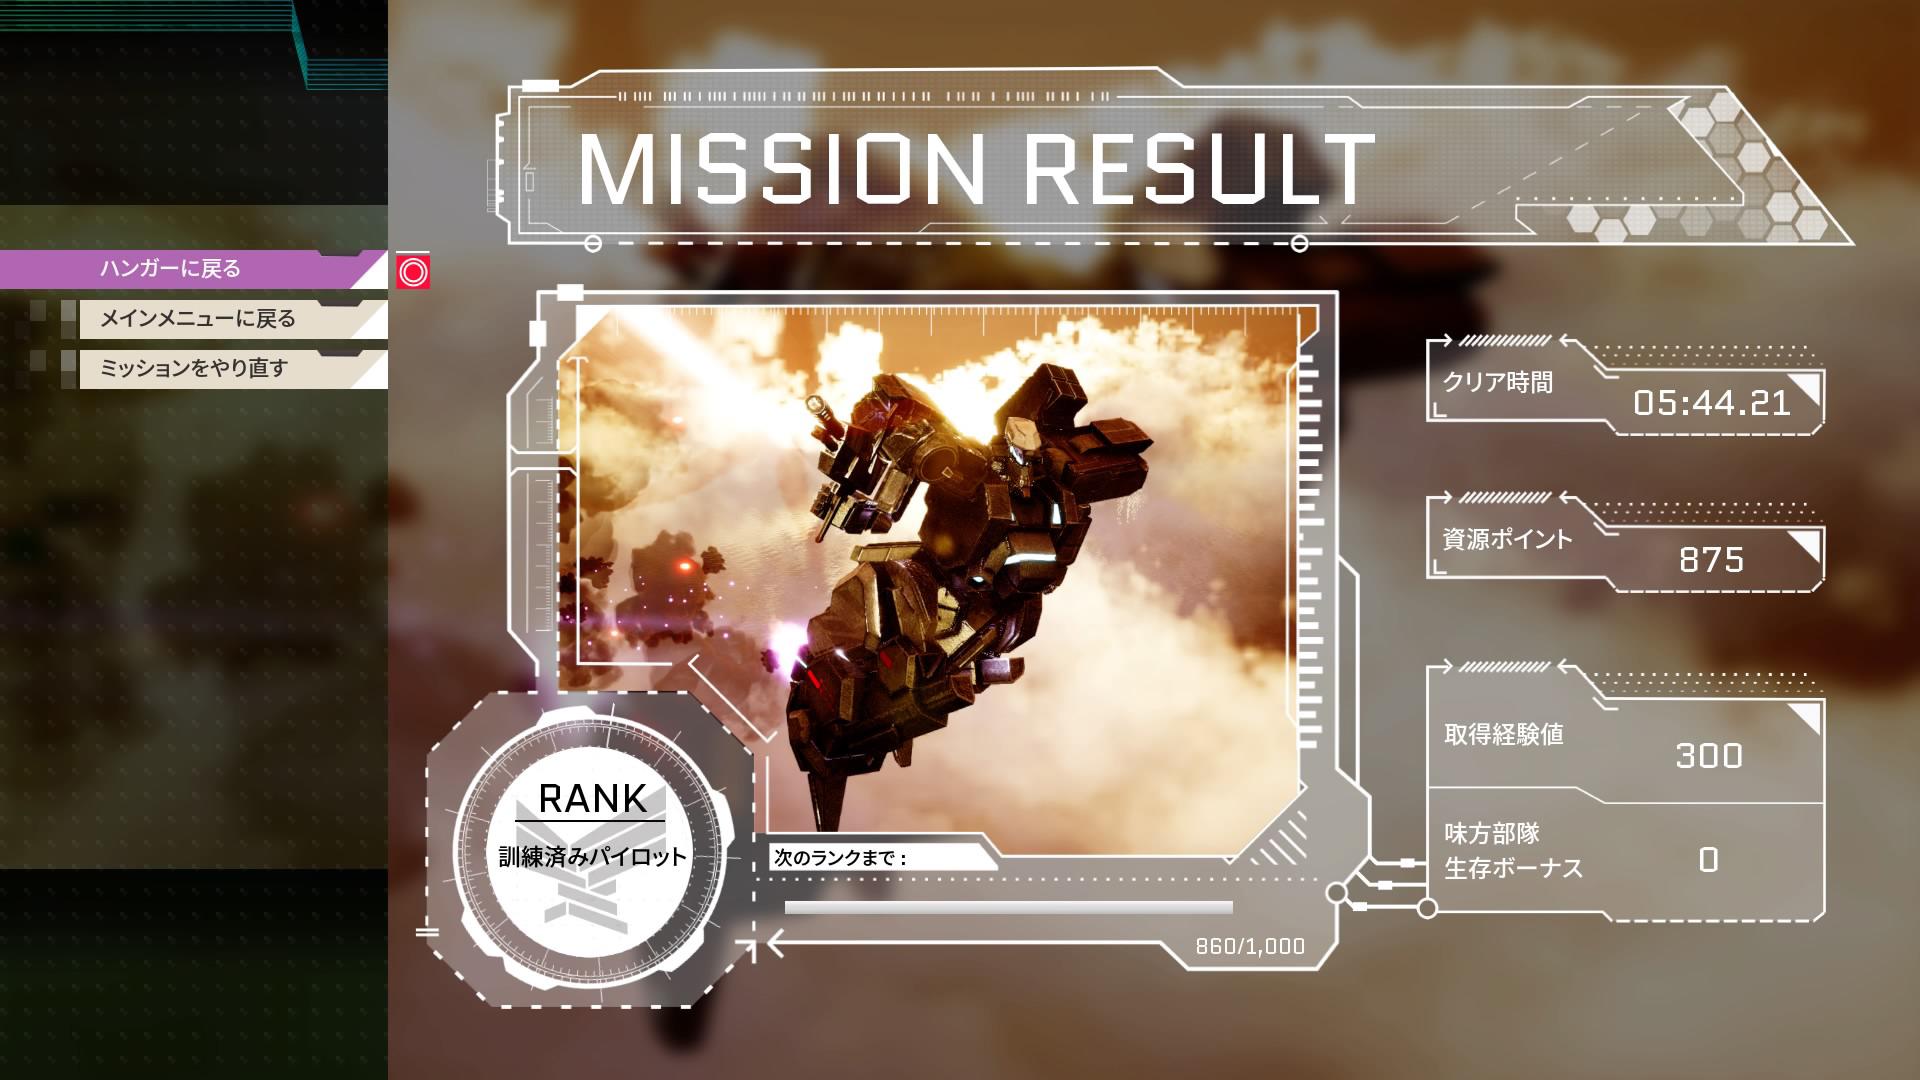 MissionResult.jpg